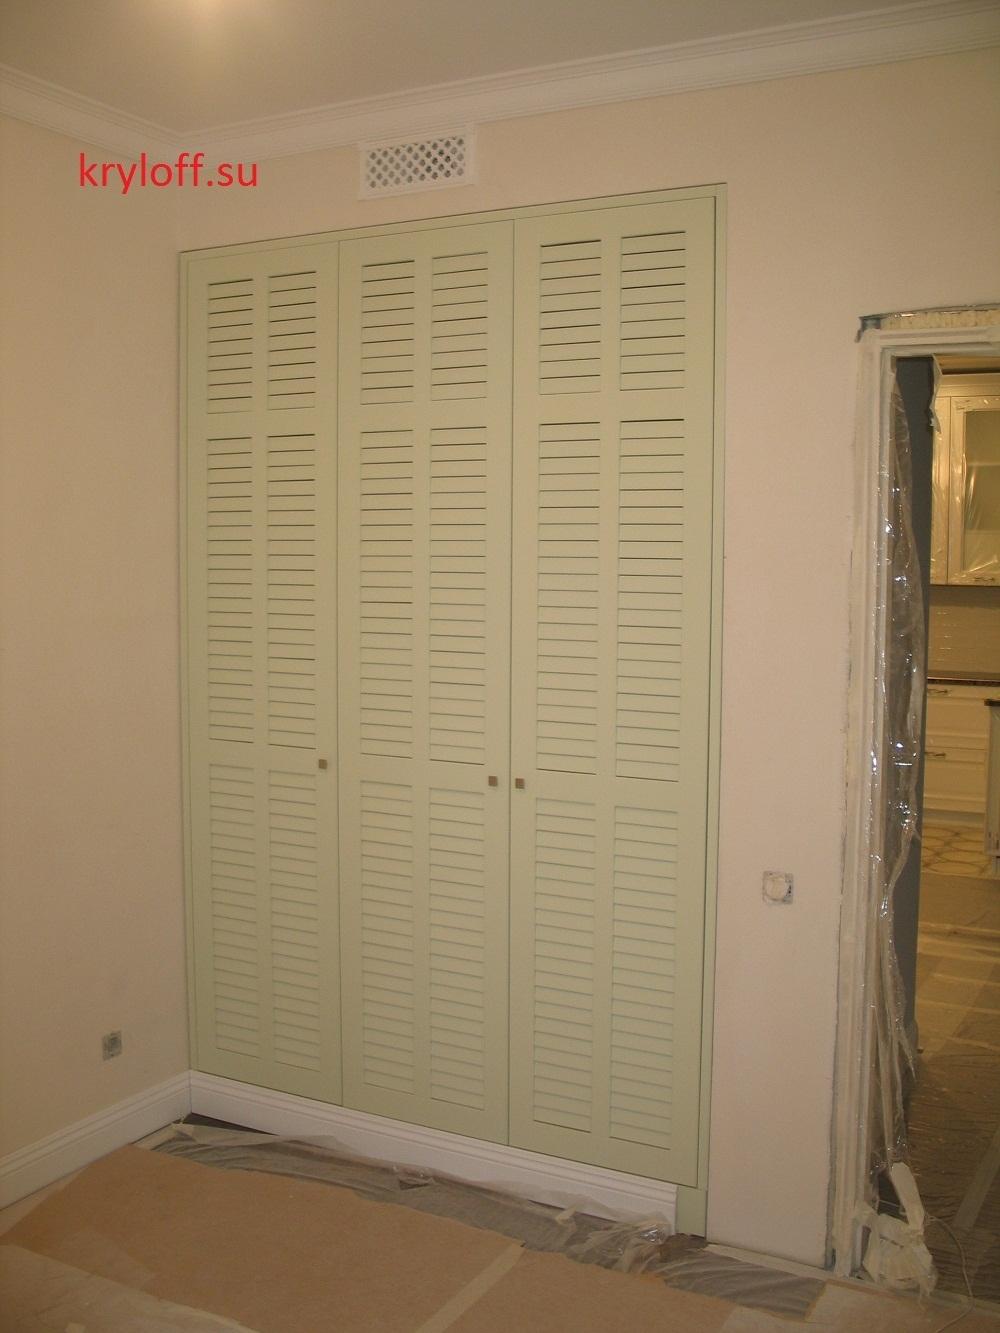 006 Трехстворчатый шкаф